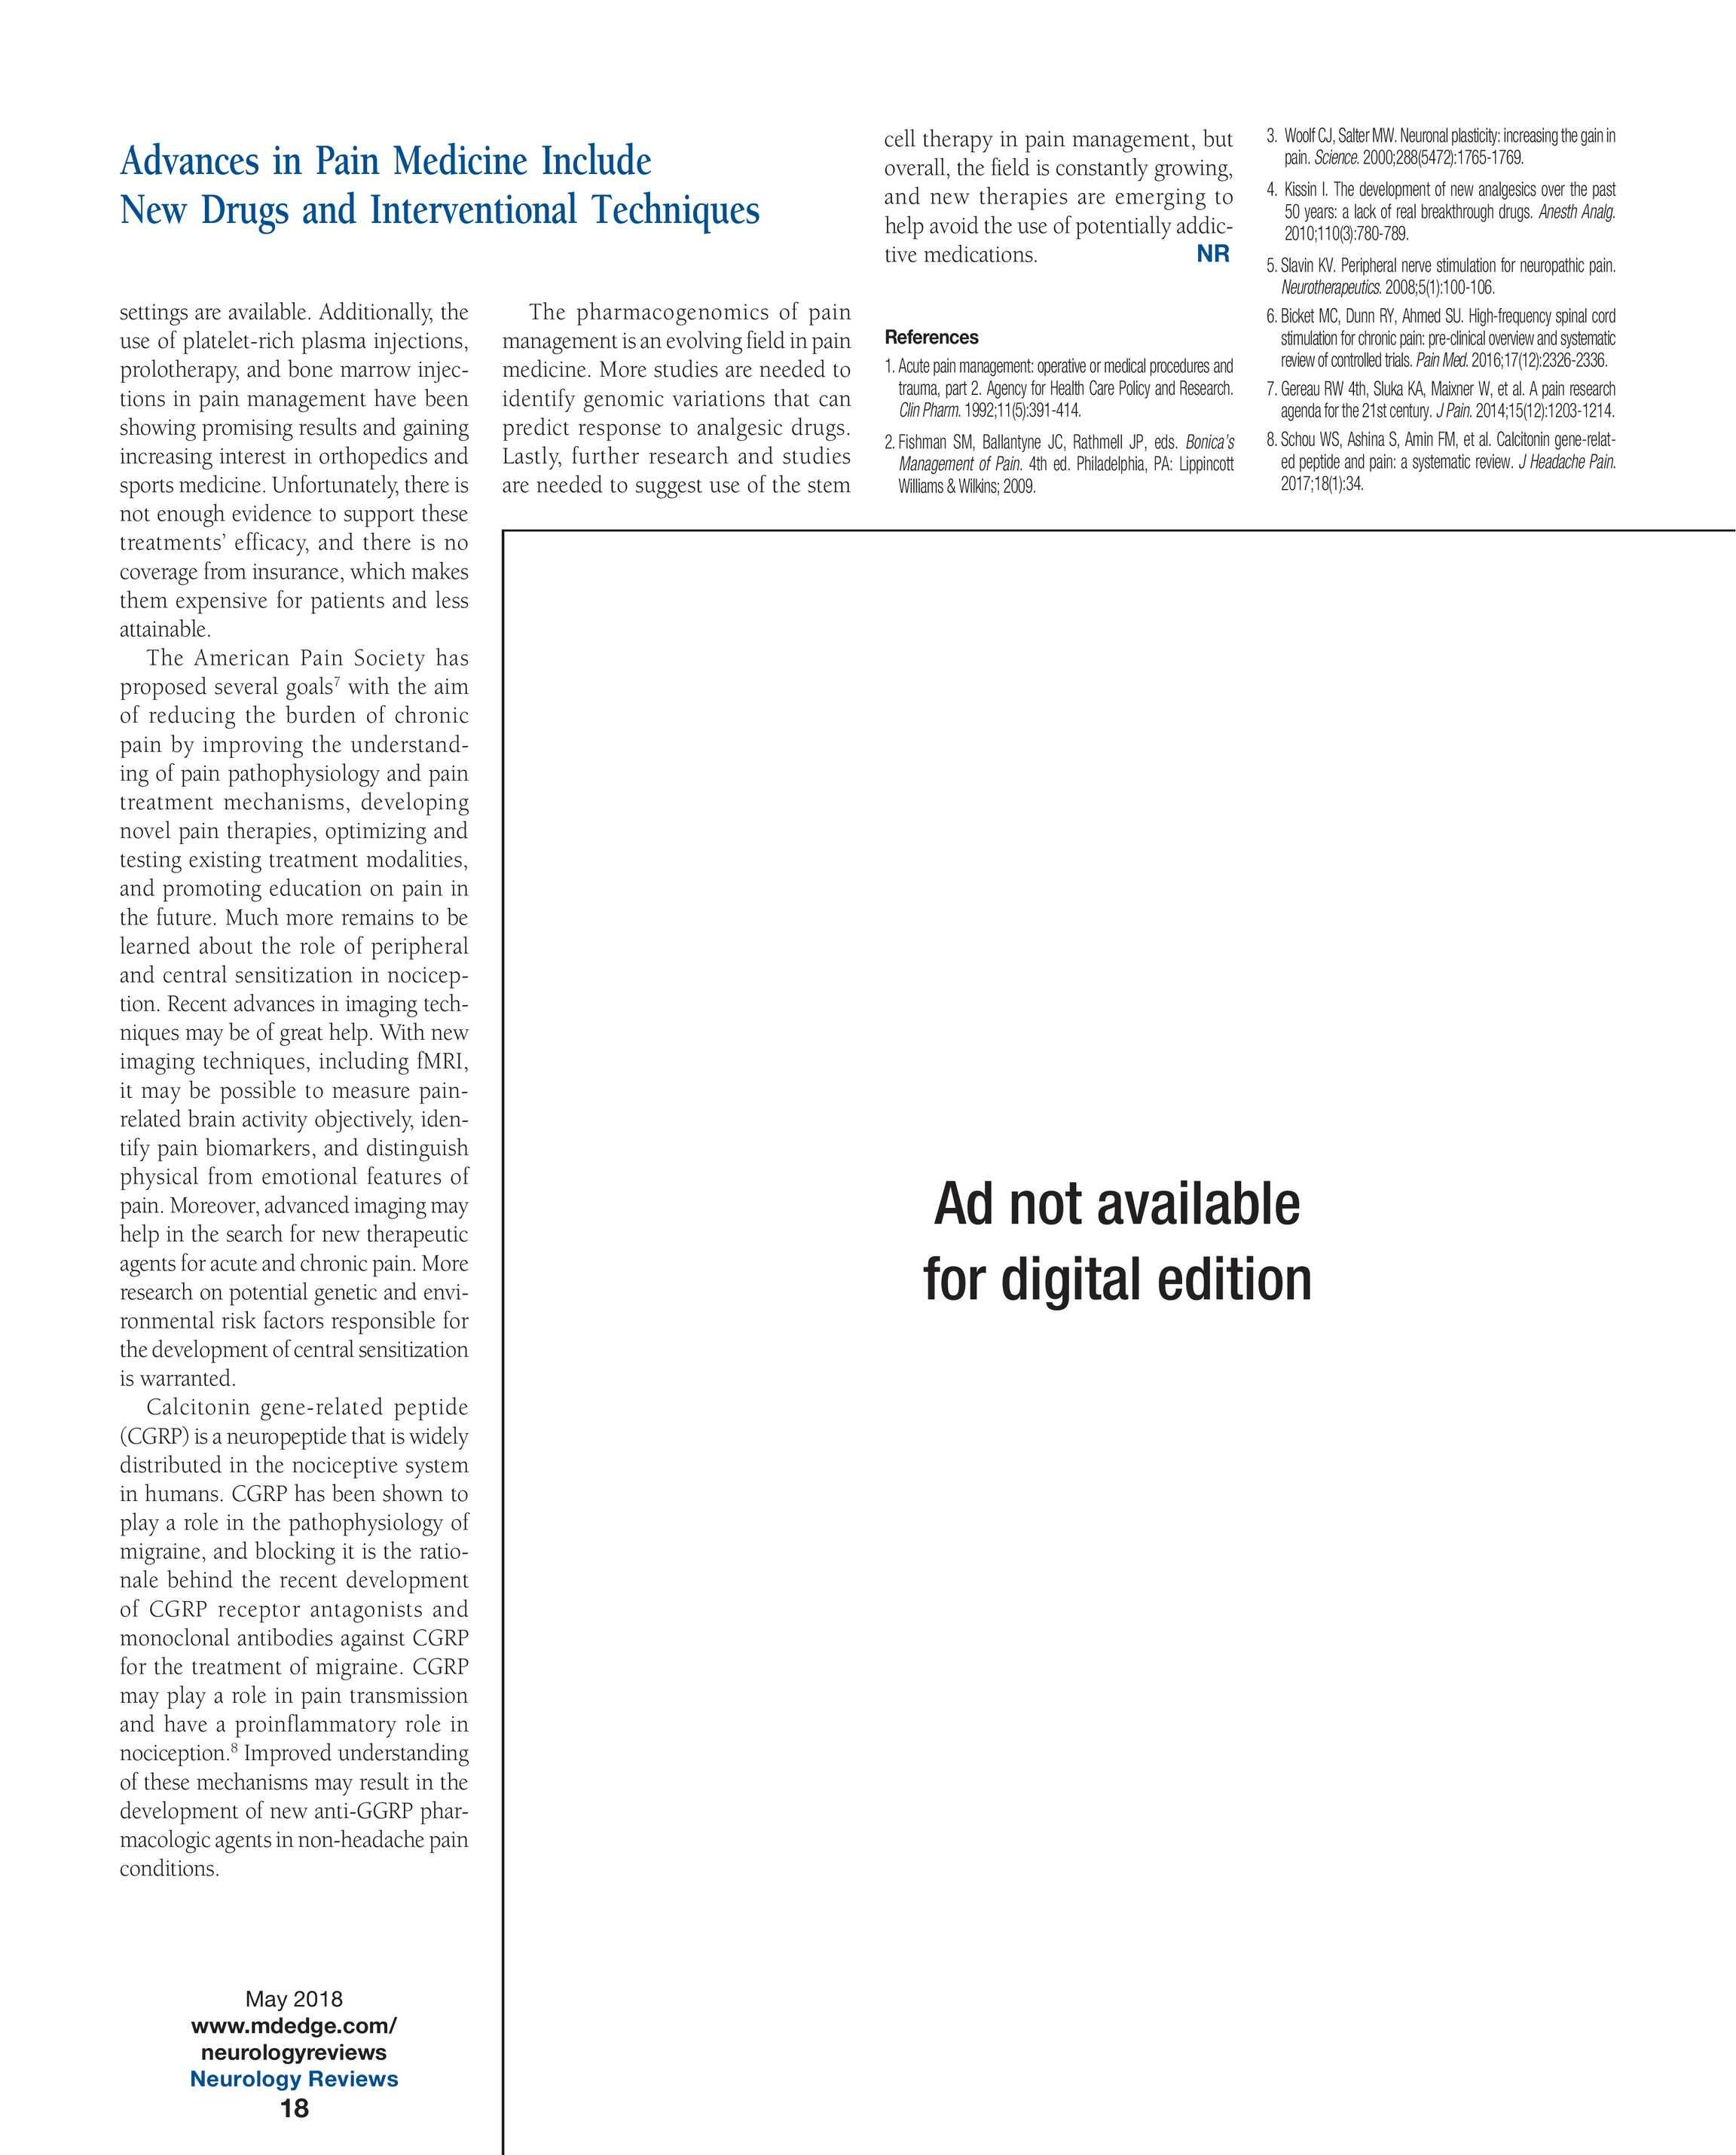 Neurology Reviews - NR MAY 2018 - page 19